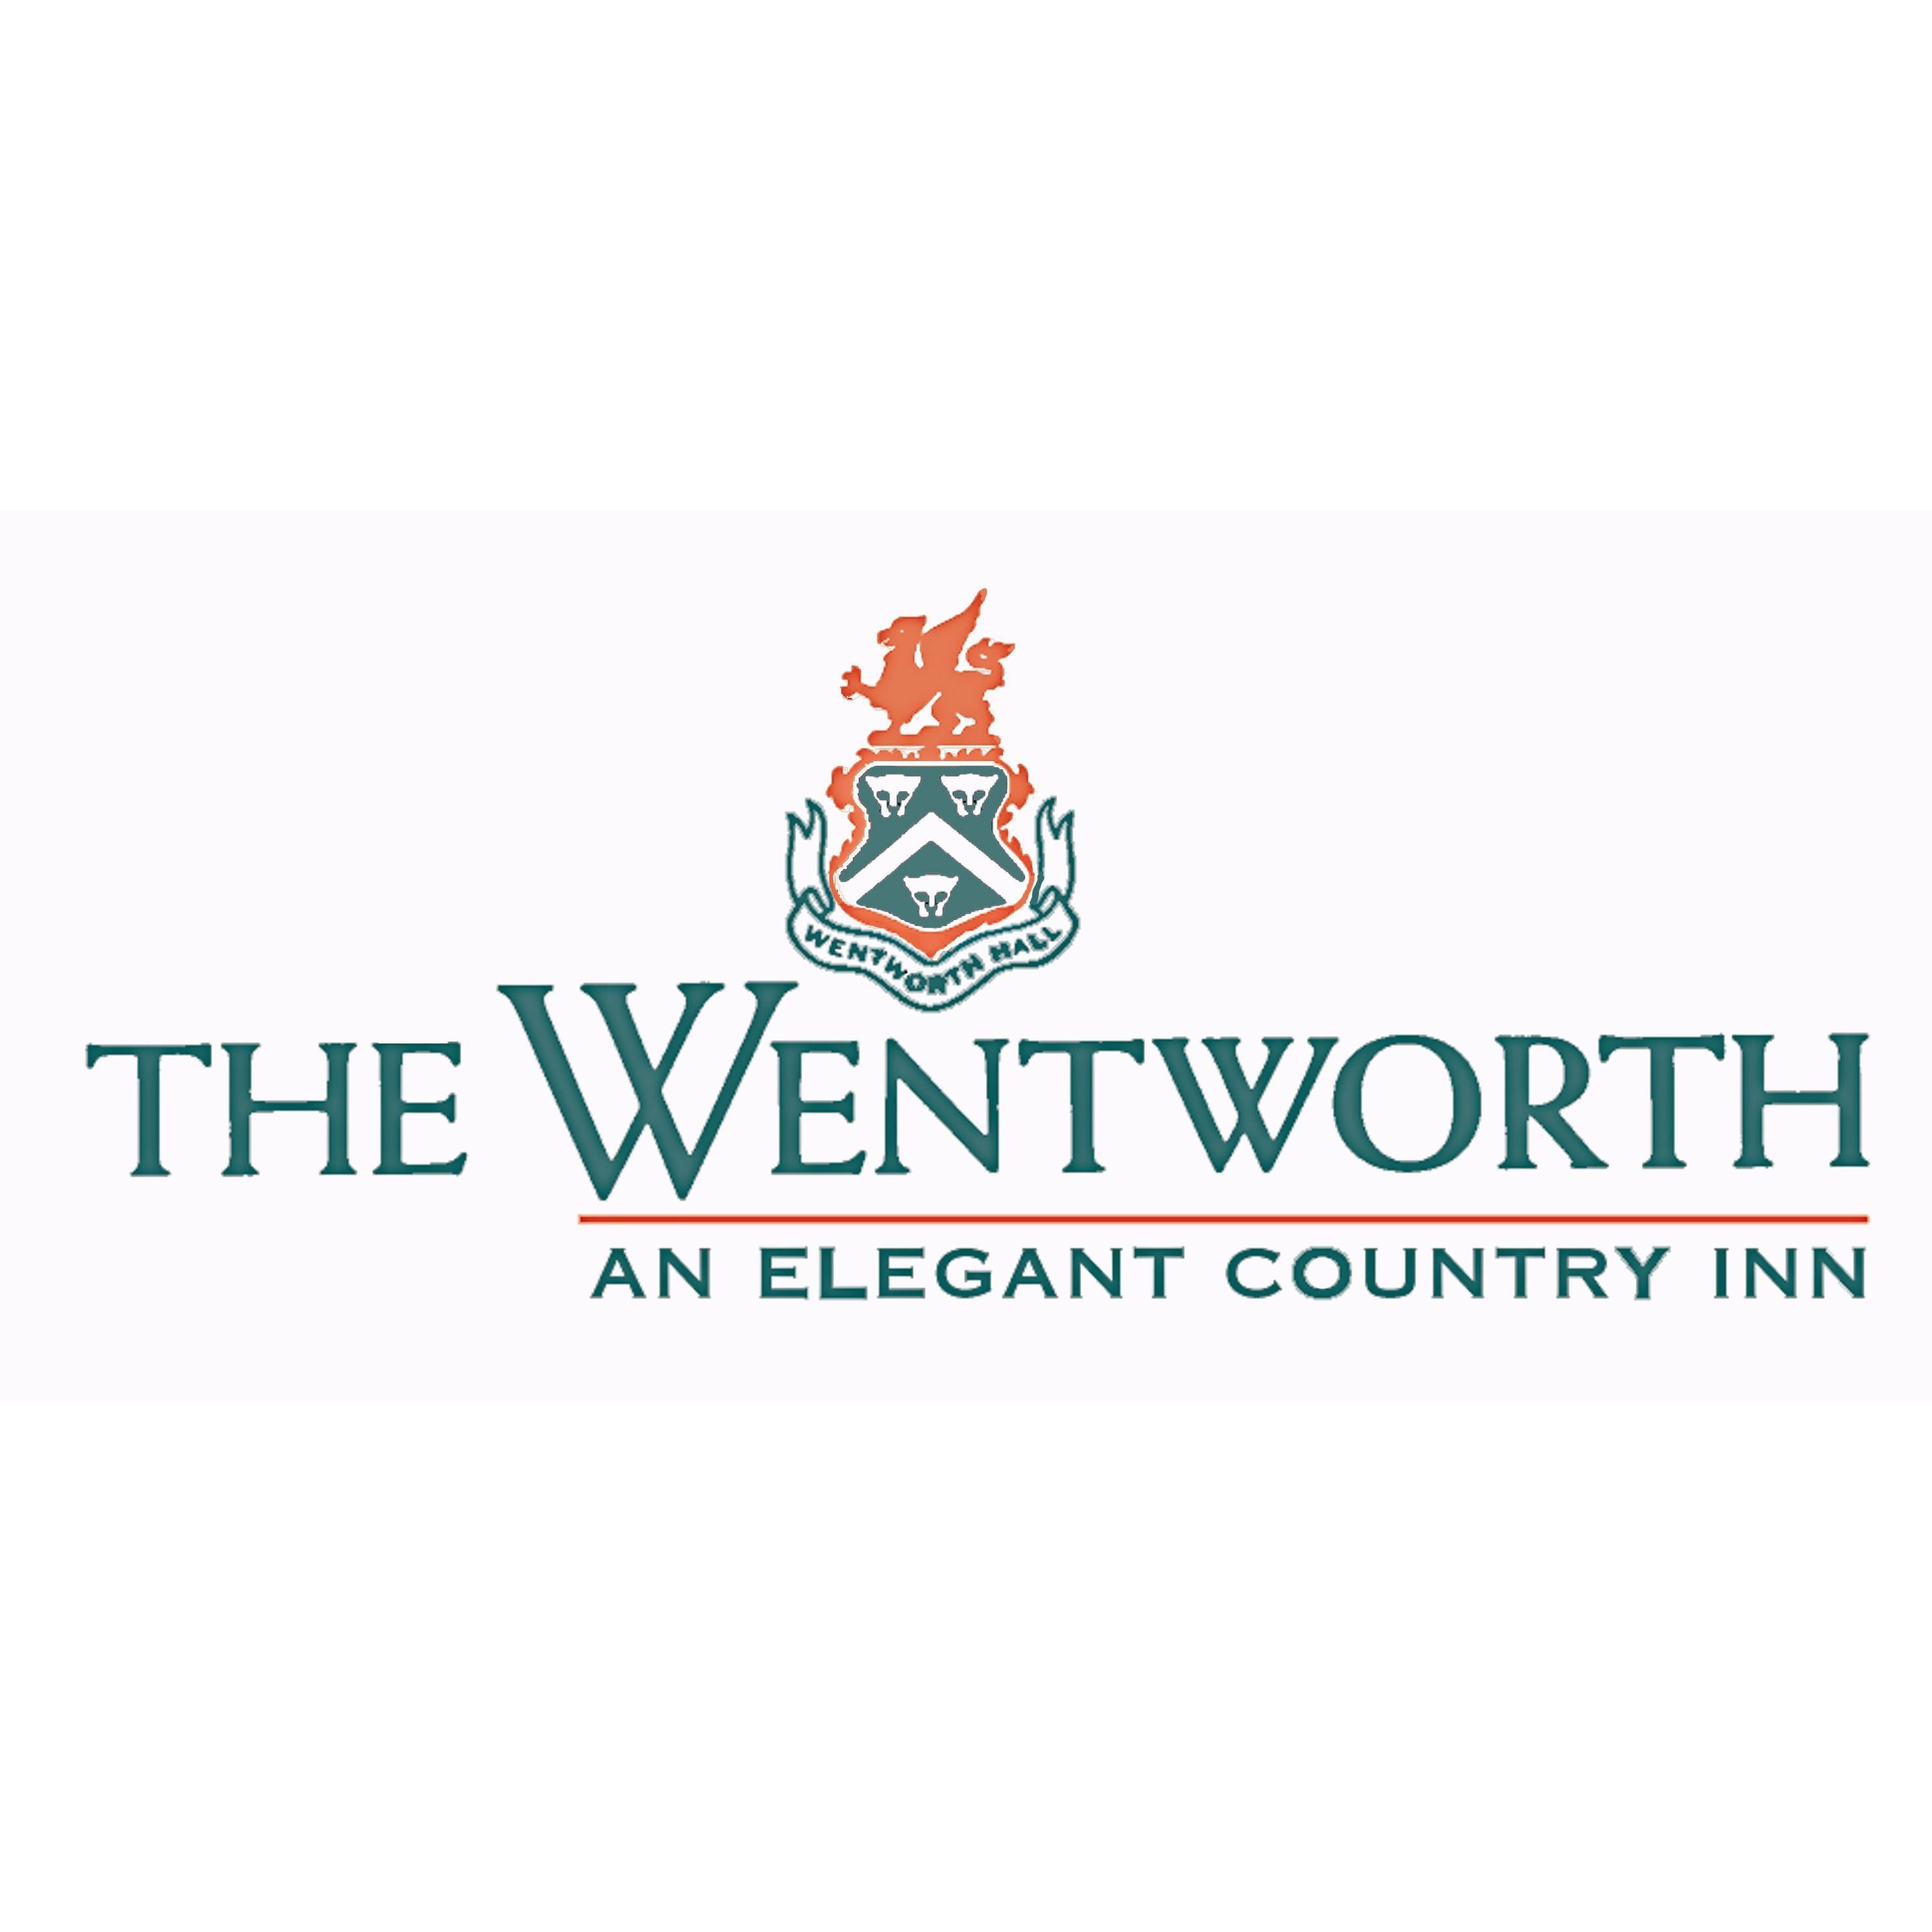 The Wentworth Inn